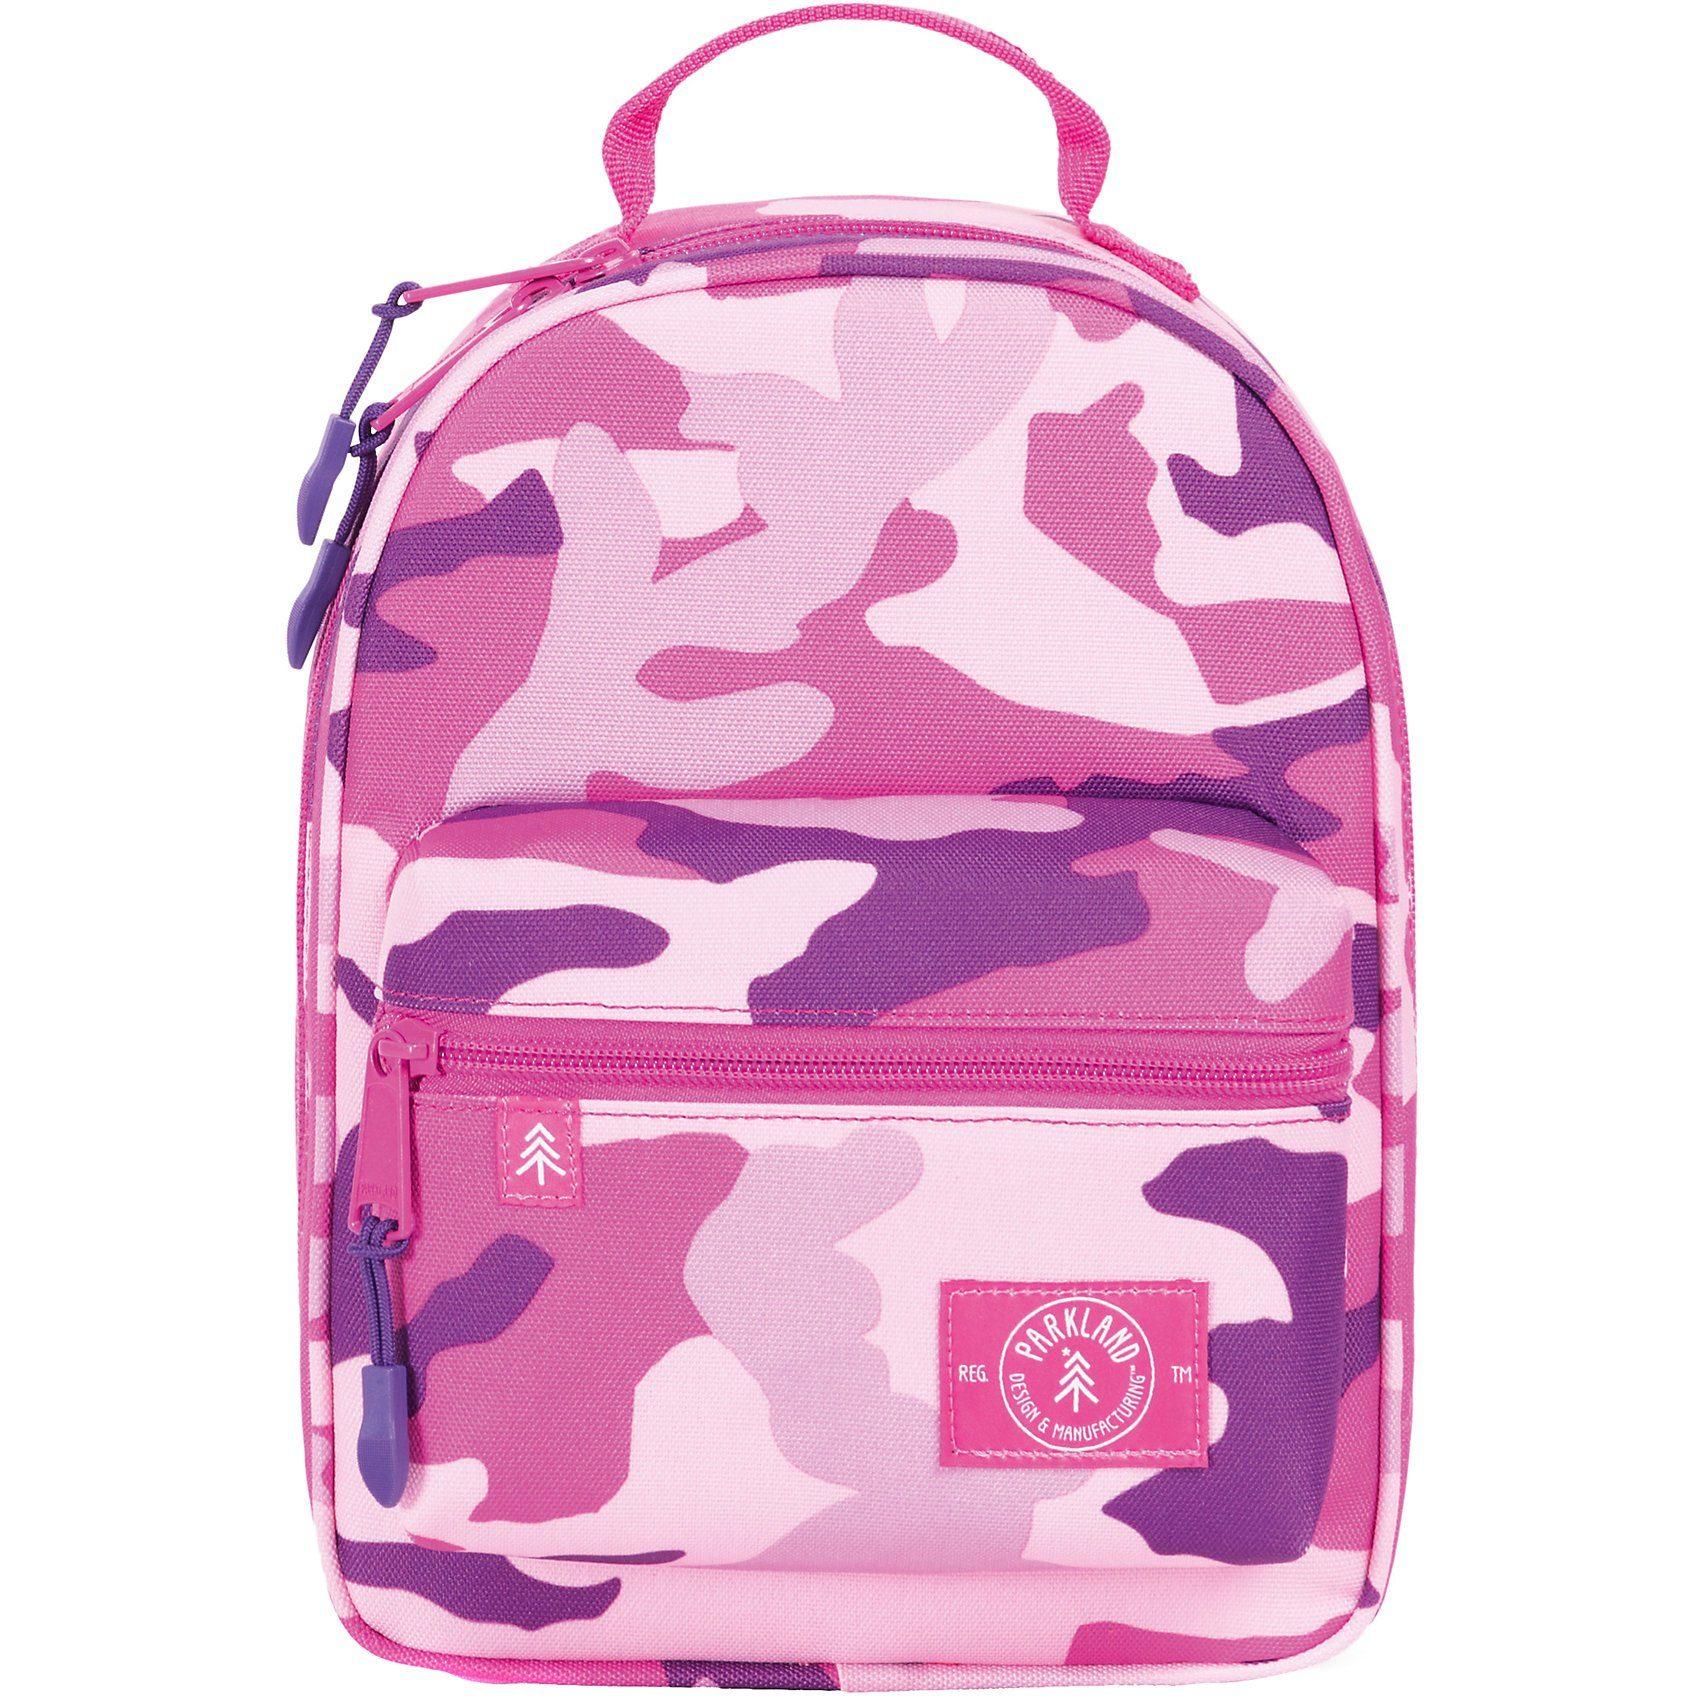 Unisex PARKLAND Kühltasche Lunch Bag THE RODEO Woodland Camo Pink rosa | 00828432199938